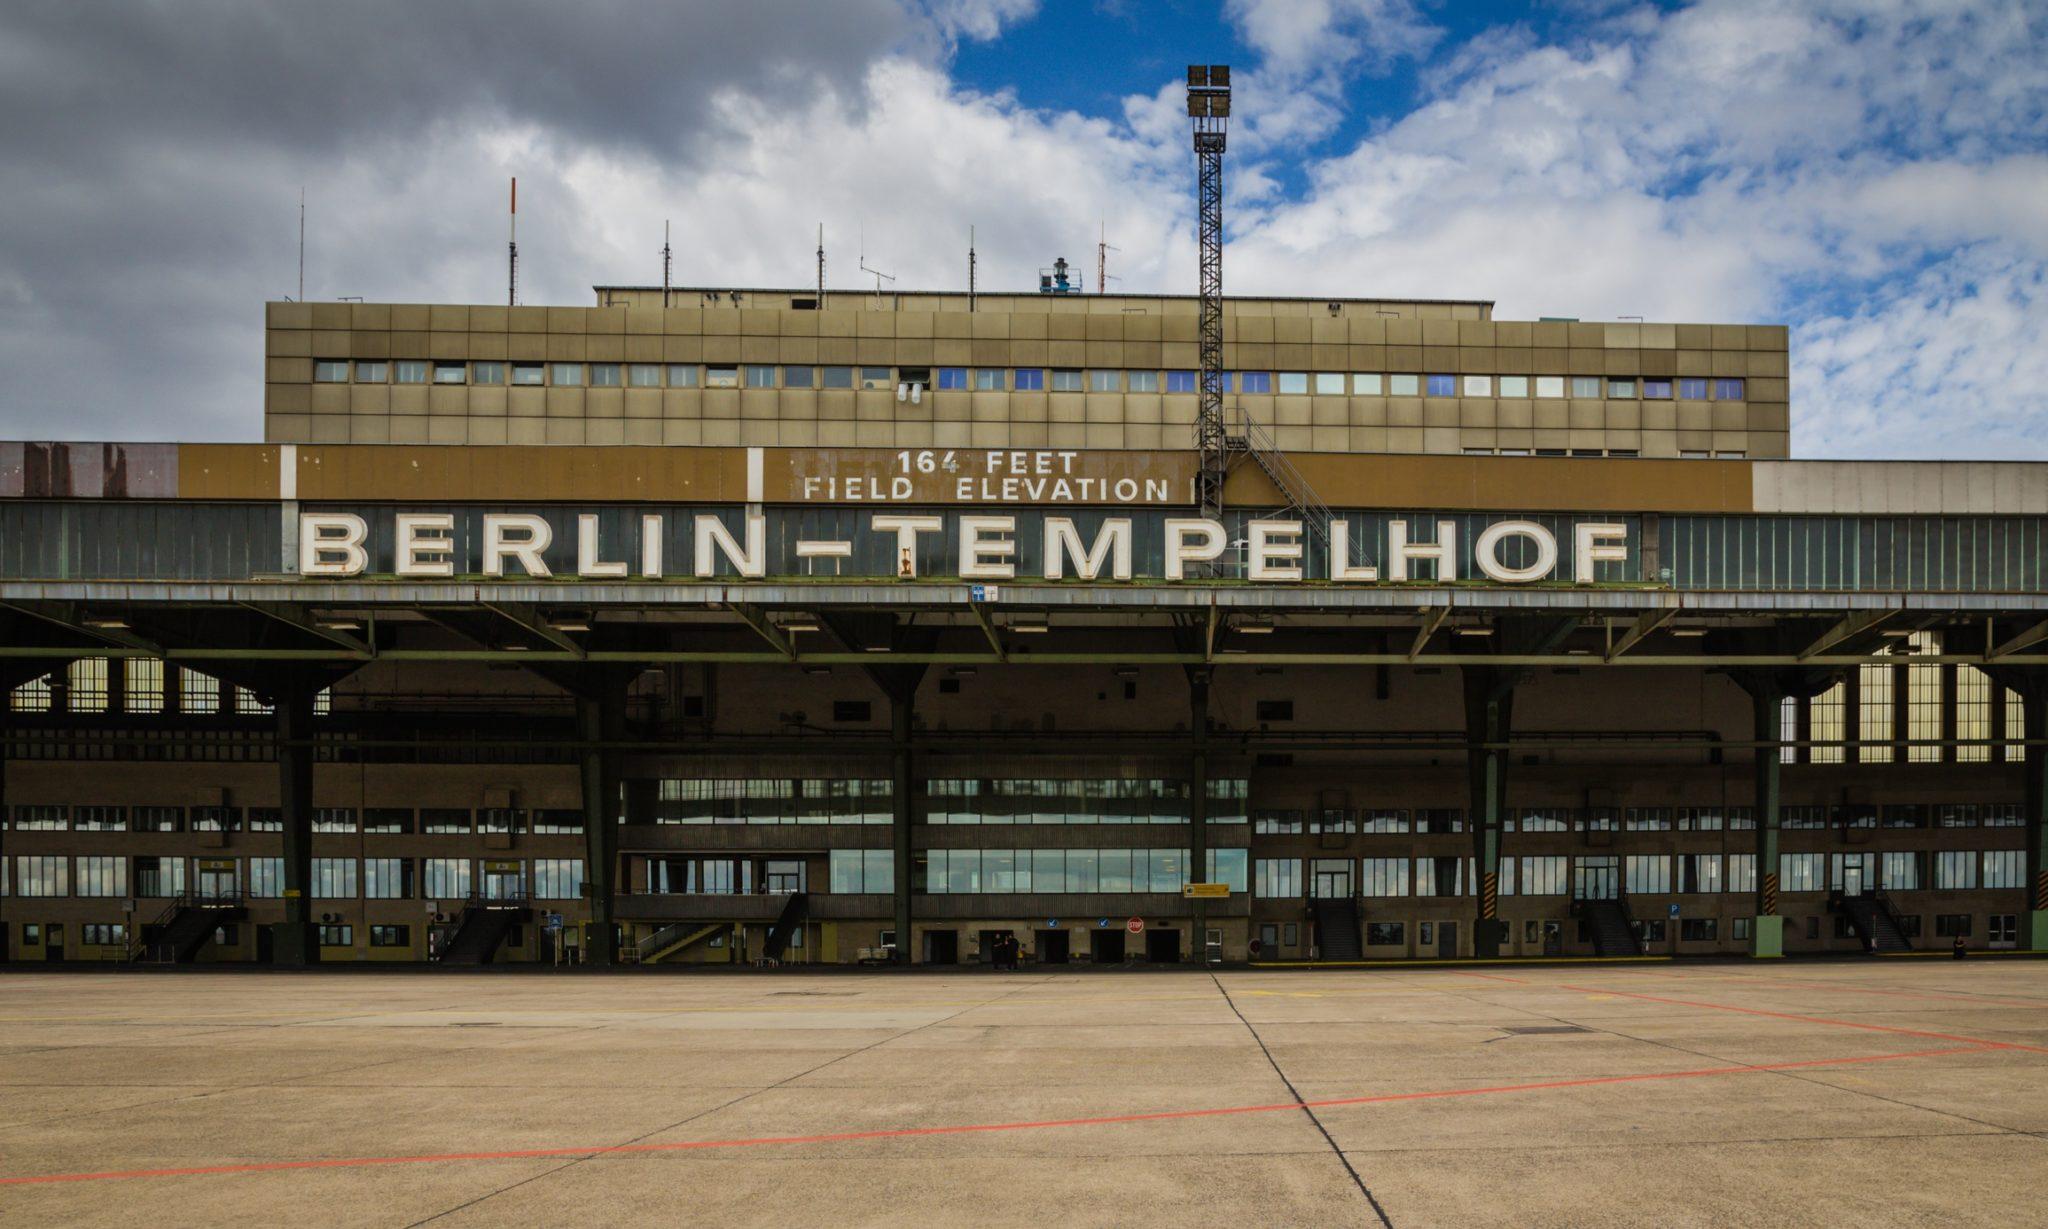 Haushaltsauflösung und Entrümpelung in Berlin Tempelhof